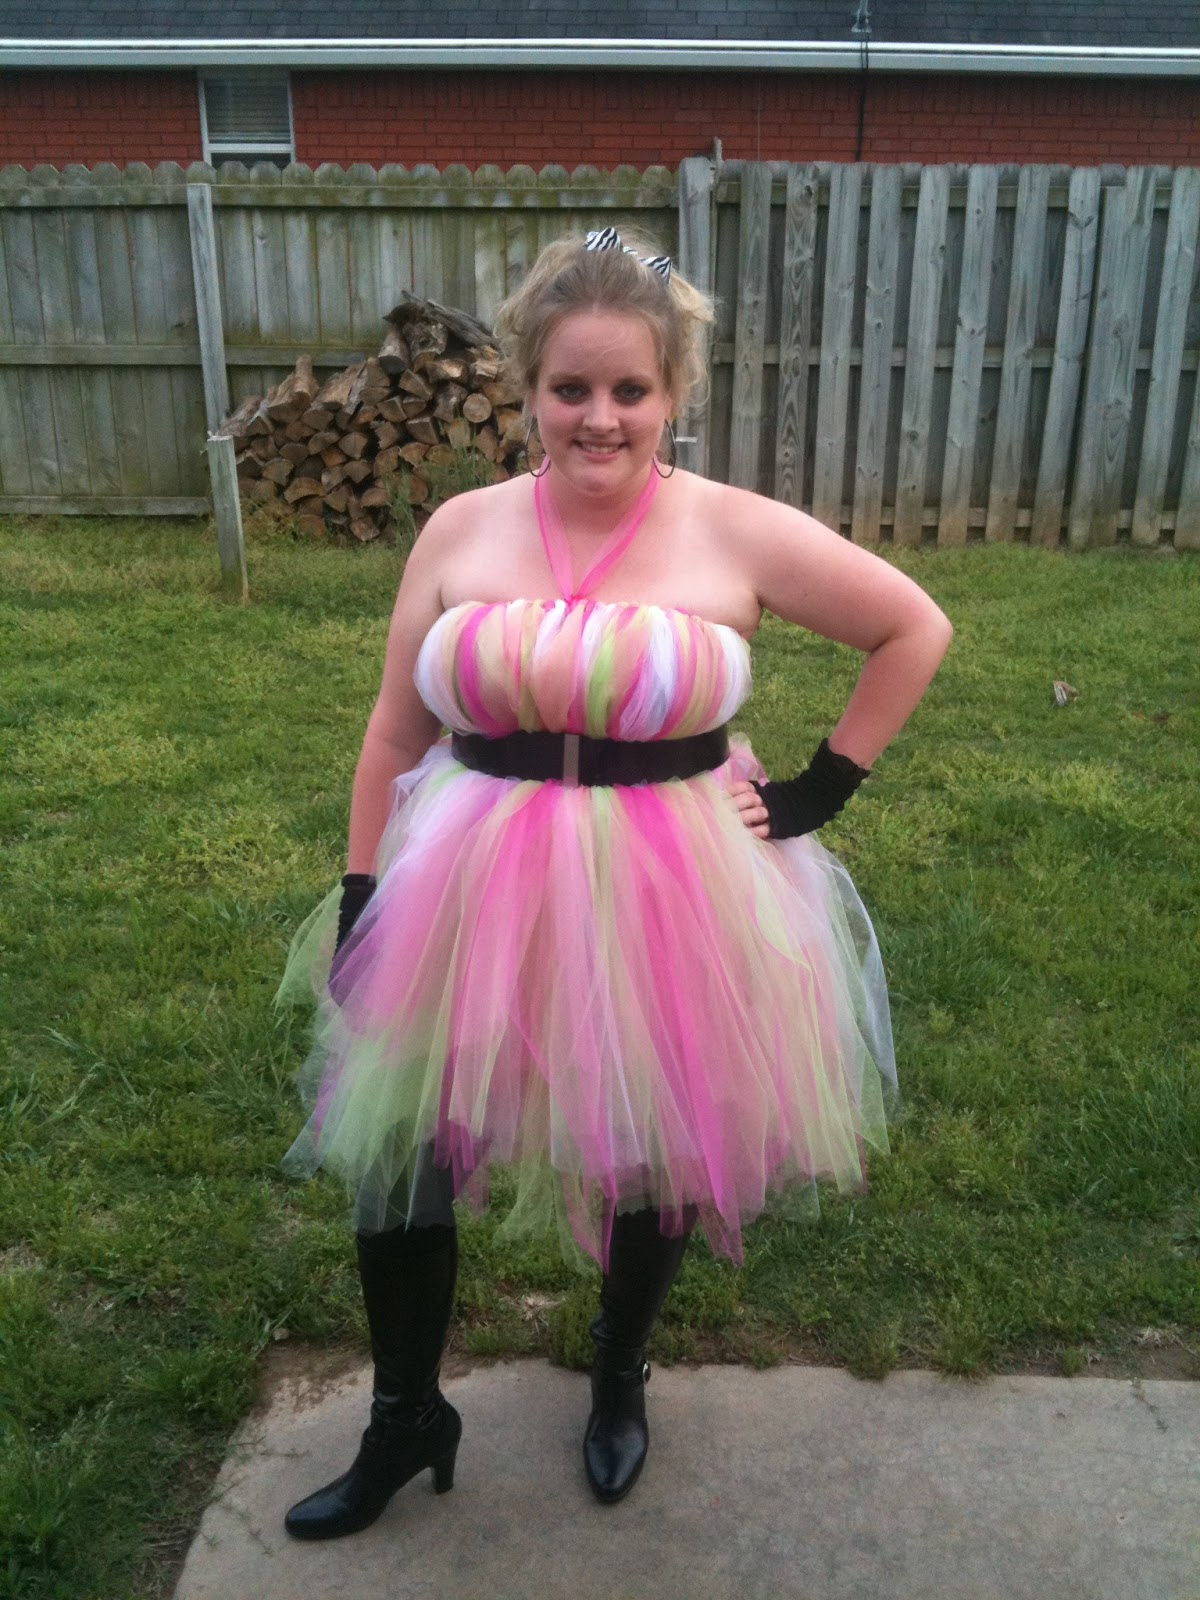 plus size wedding attire